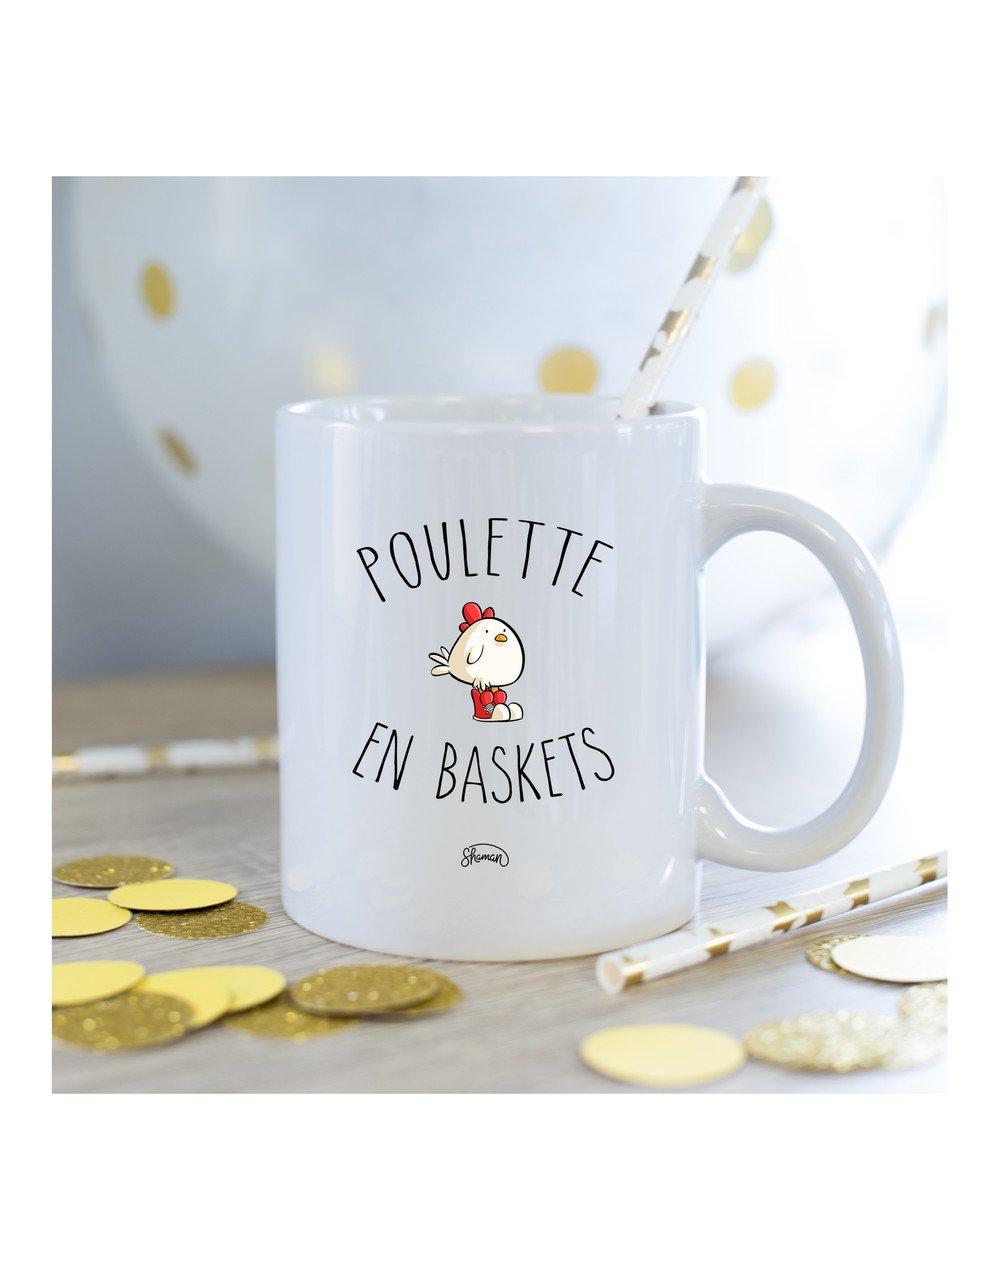 Mug Poulette en baskets